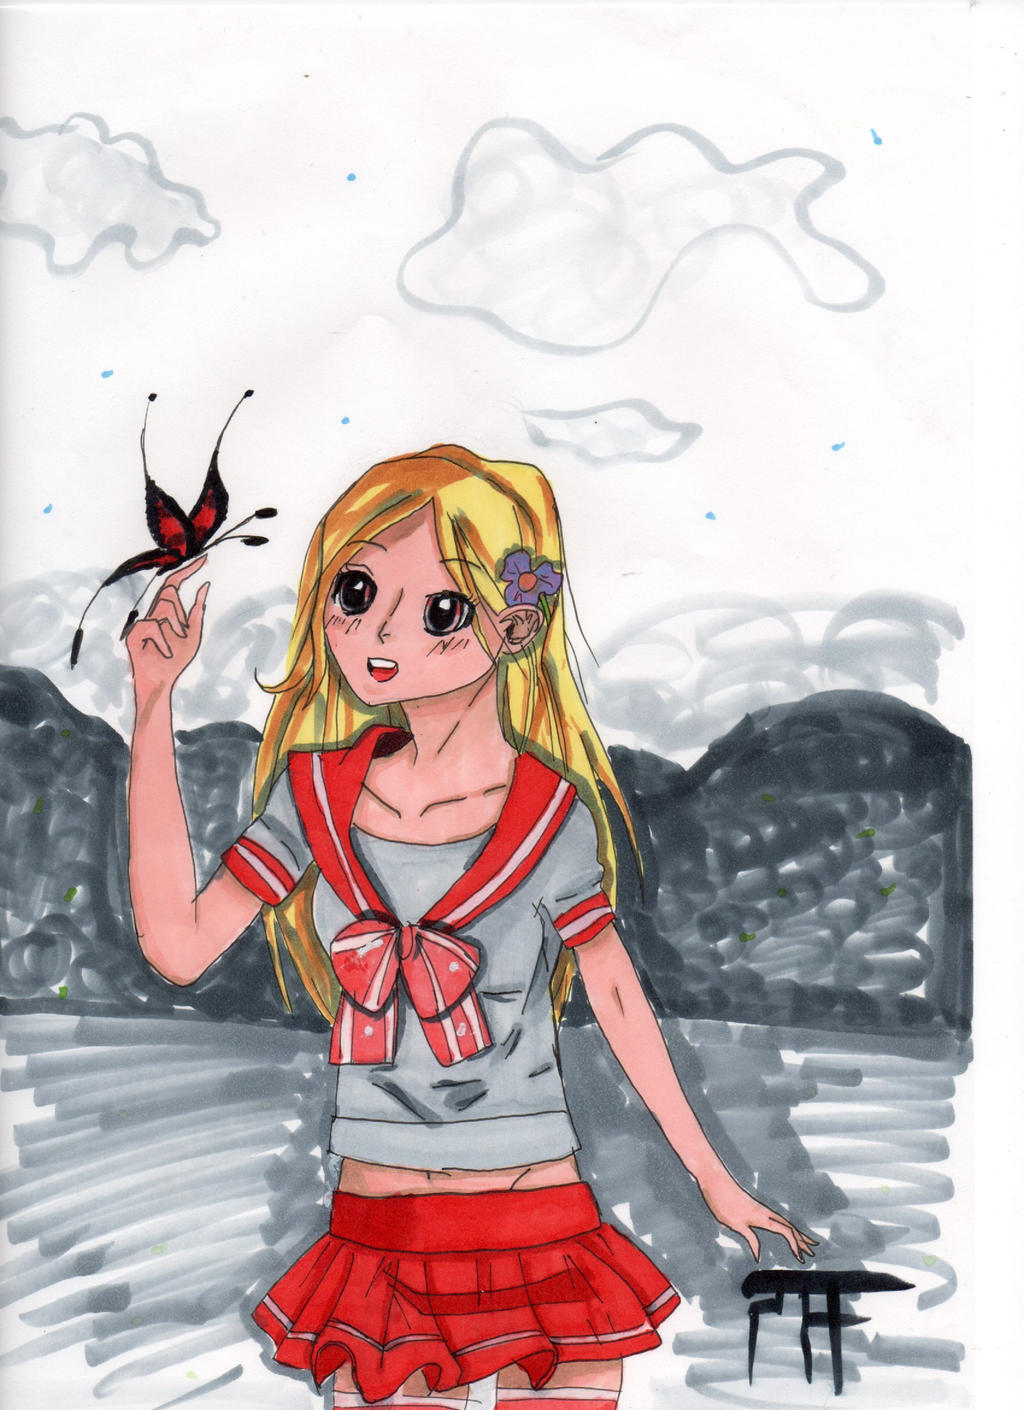 Fillette Au Papillon Dessin Manga By Jijo2448 On Deviantart